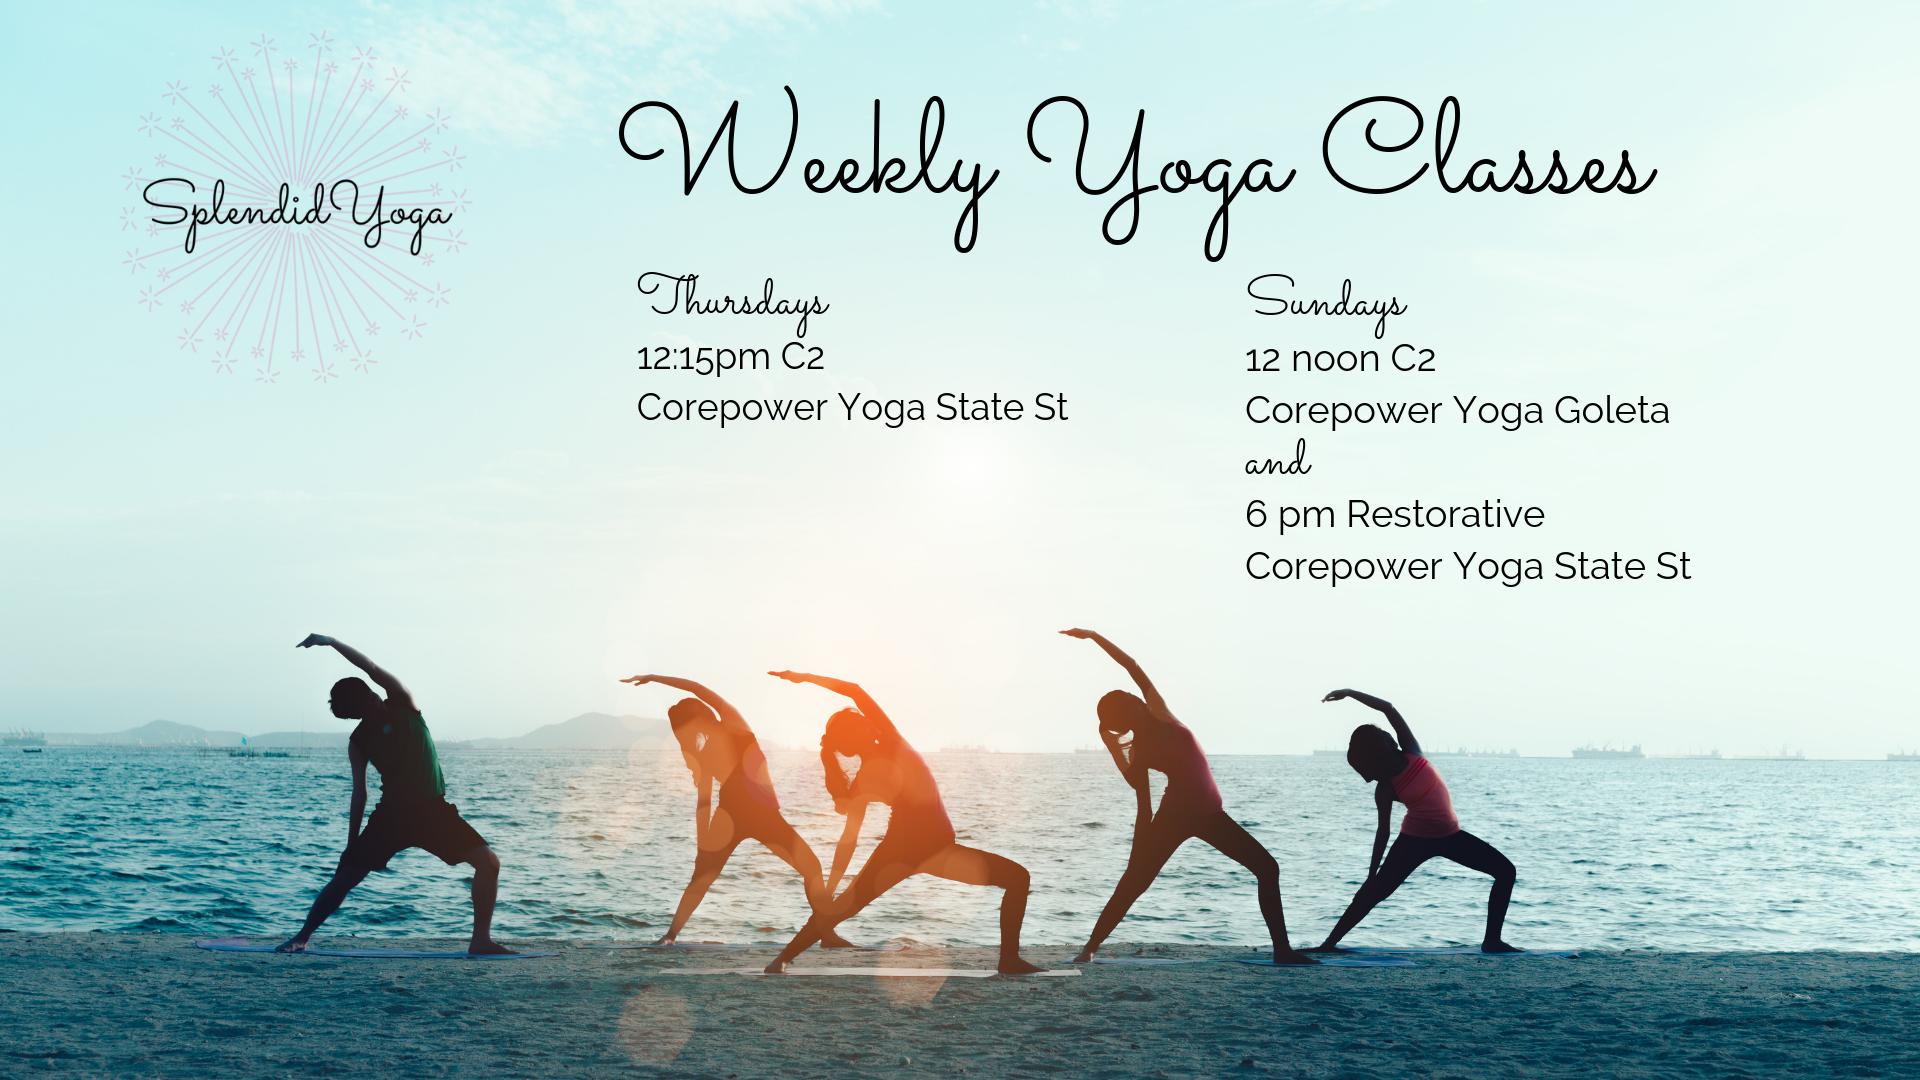 Splendid Yoga Morgan Balavage Yoga Classes Santa Barbara